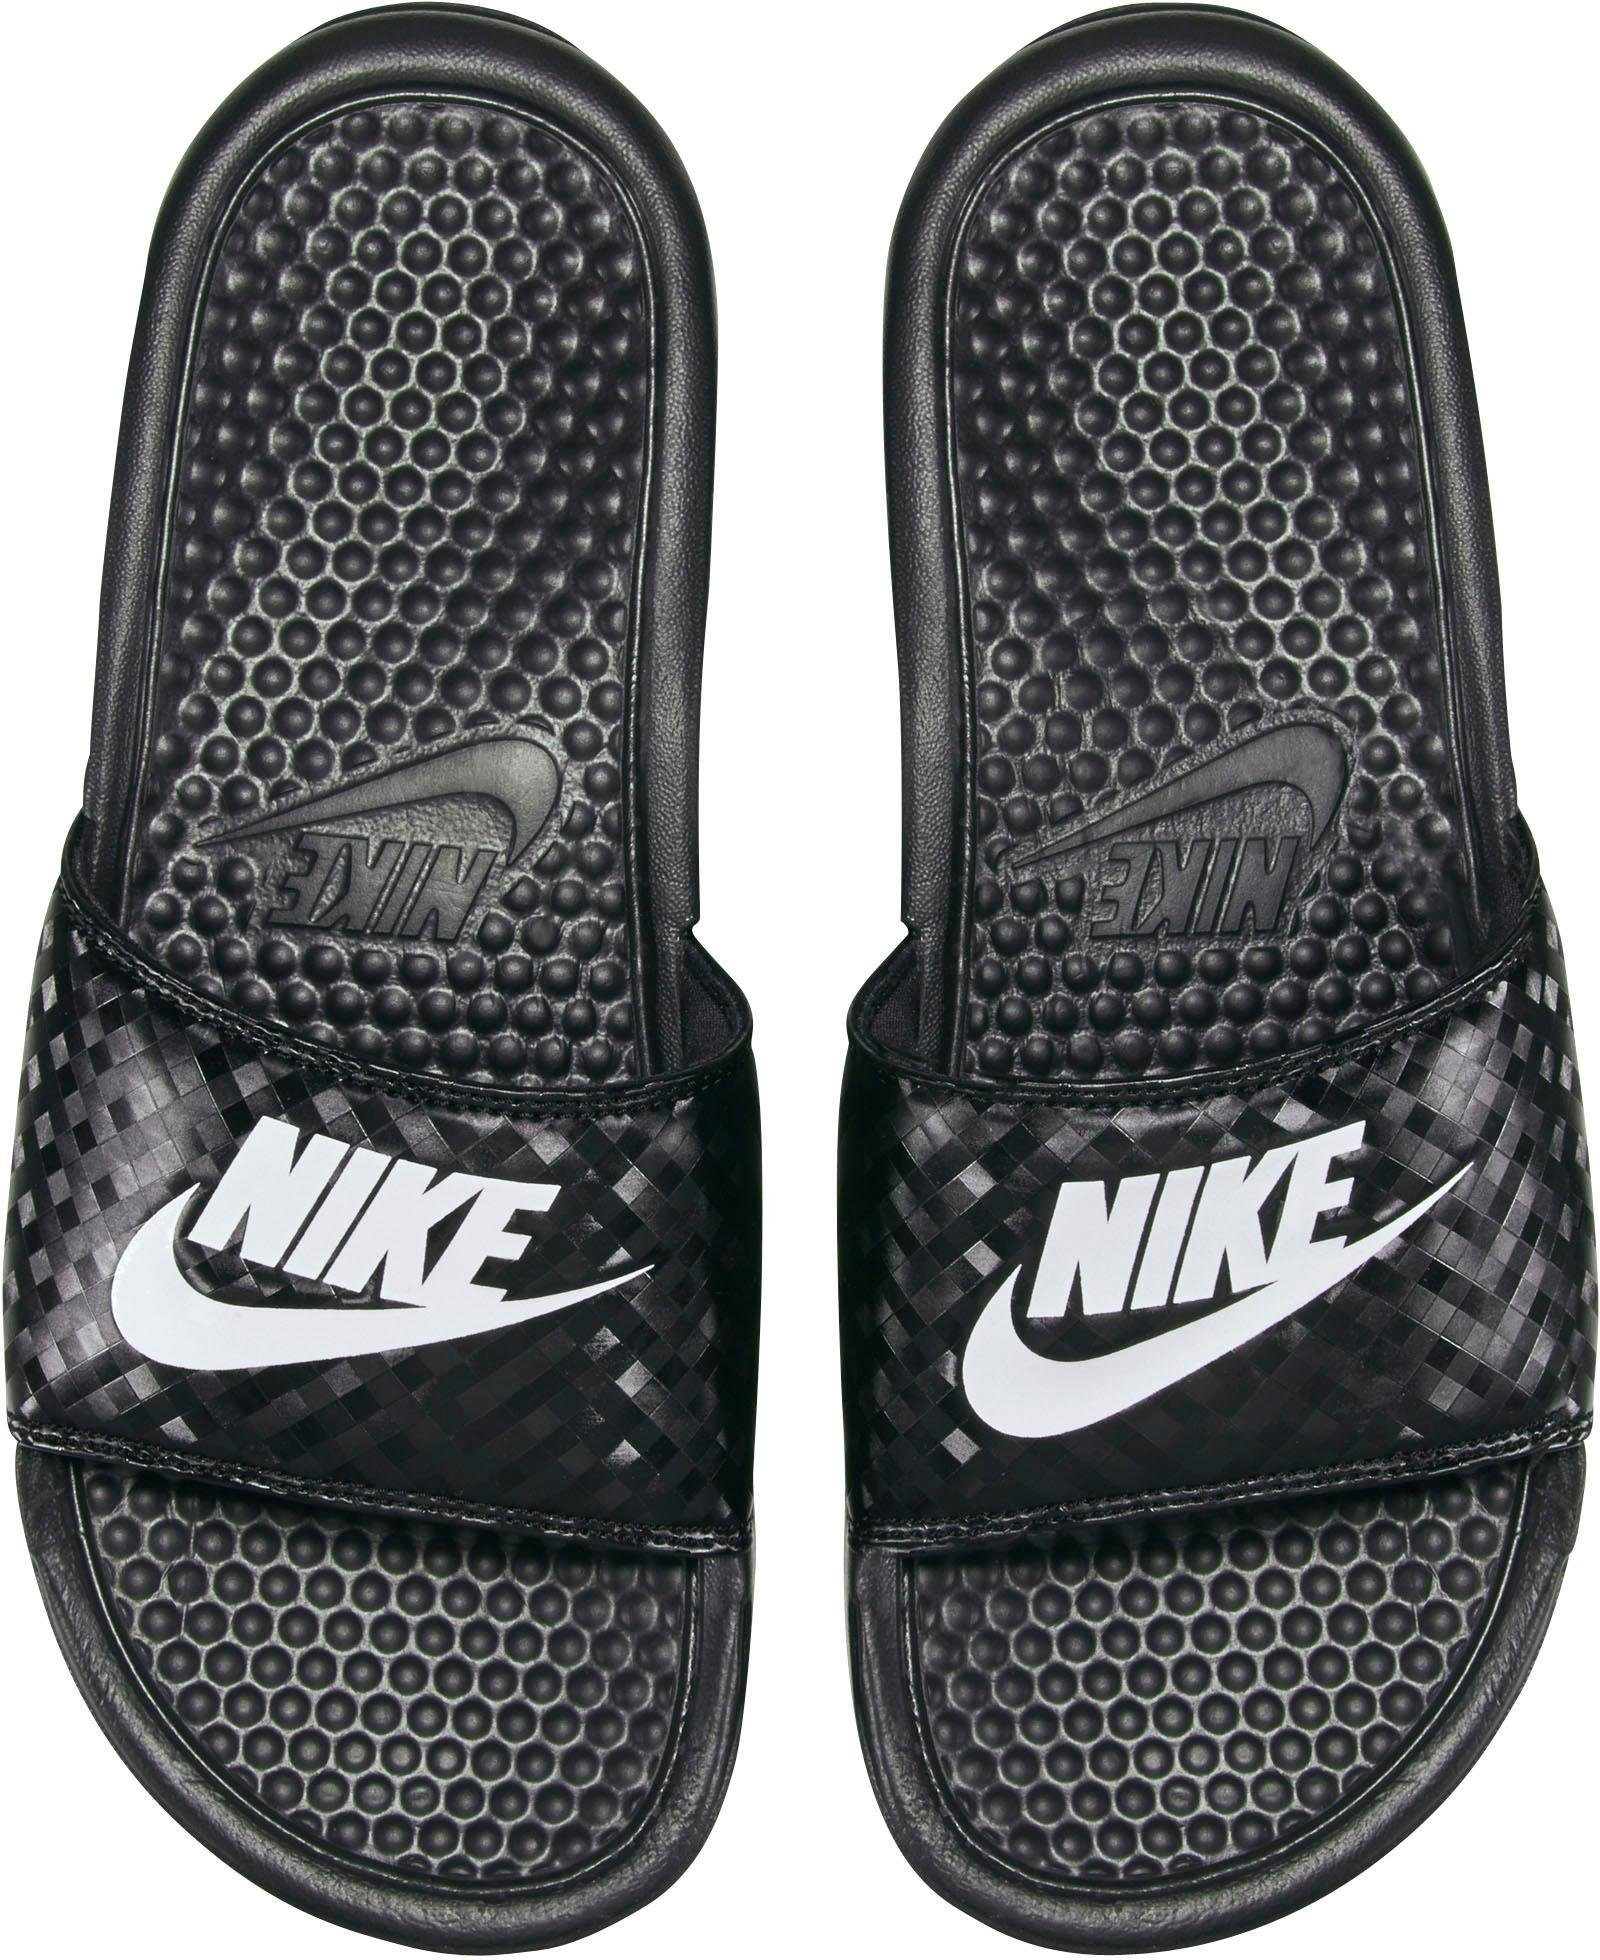 Nike Sportswear Wmns Benassi JDI Badesandale  schwarz-weiß